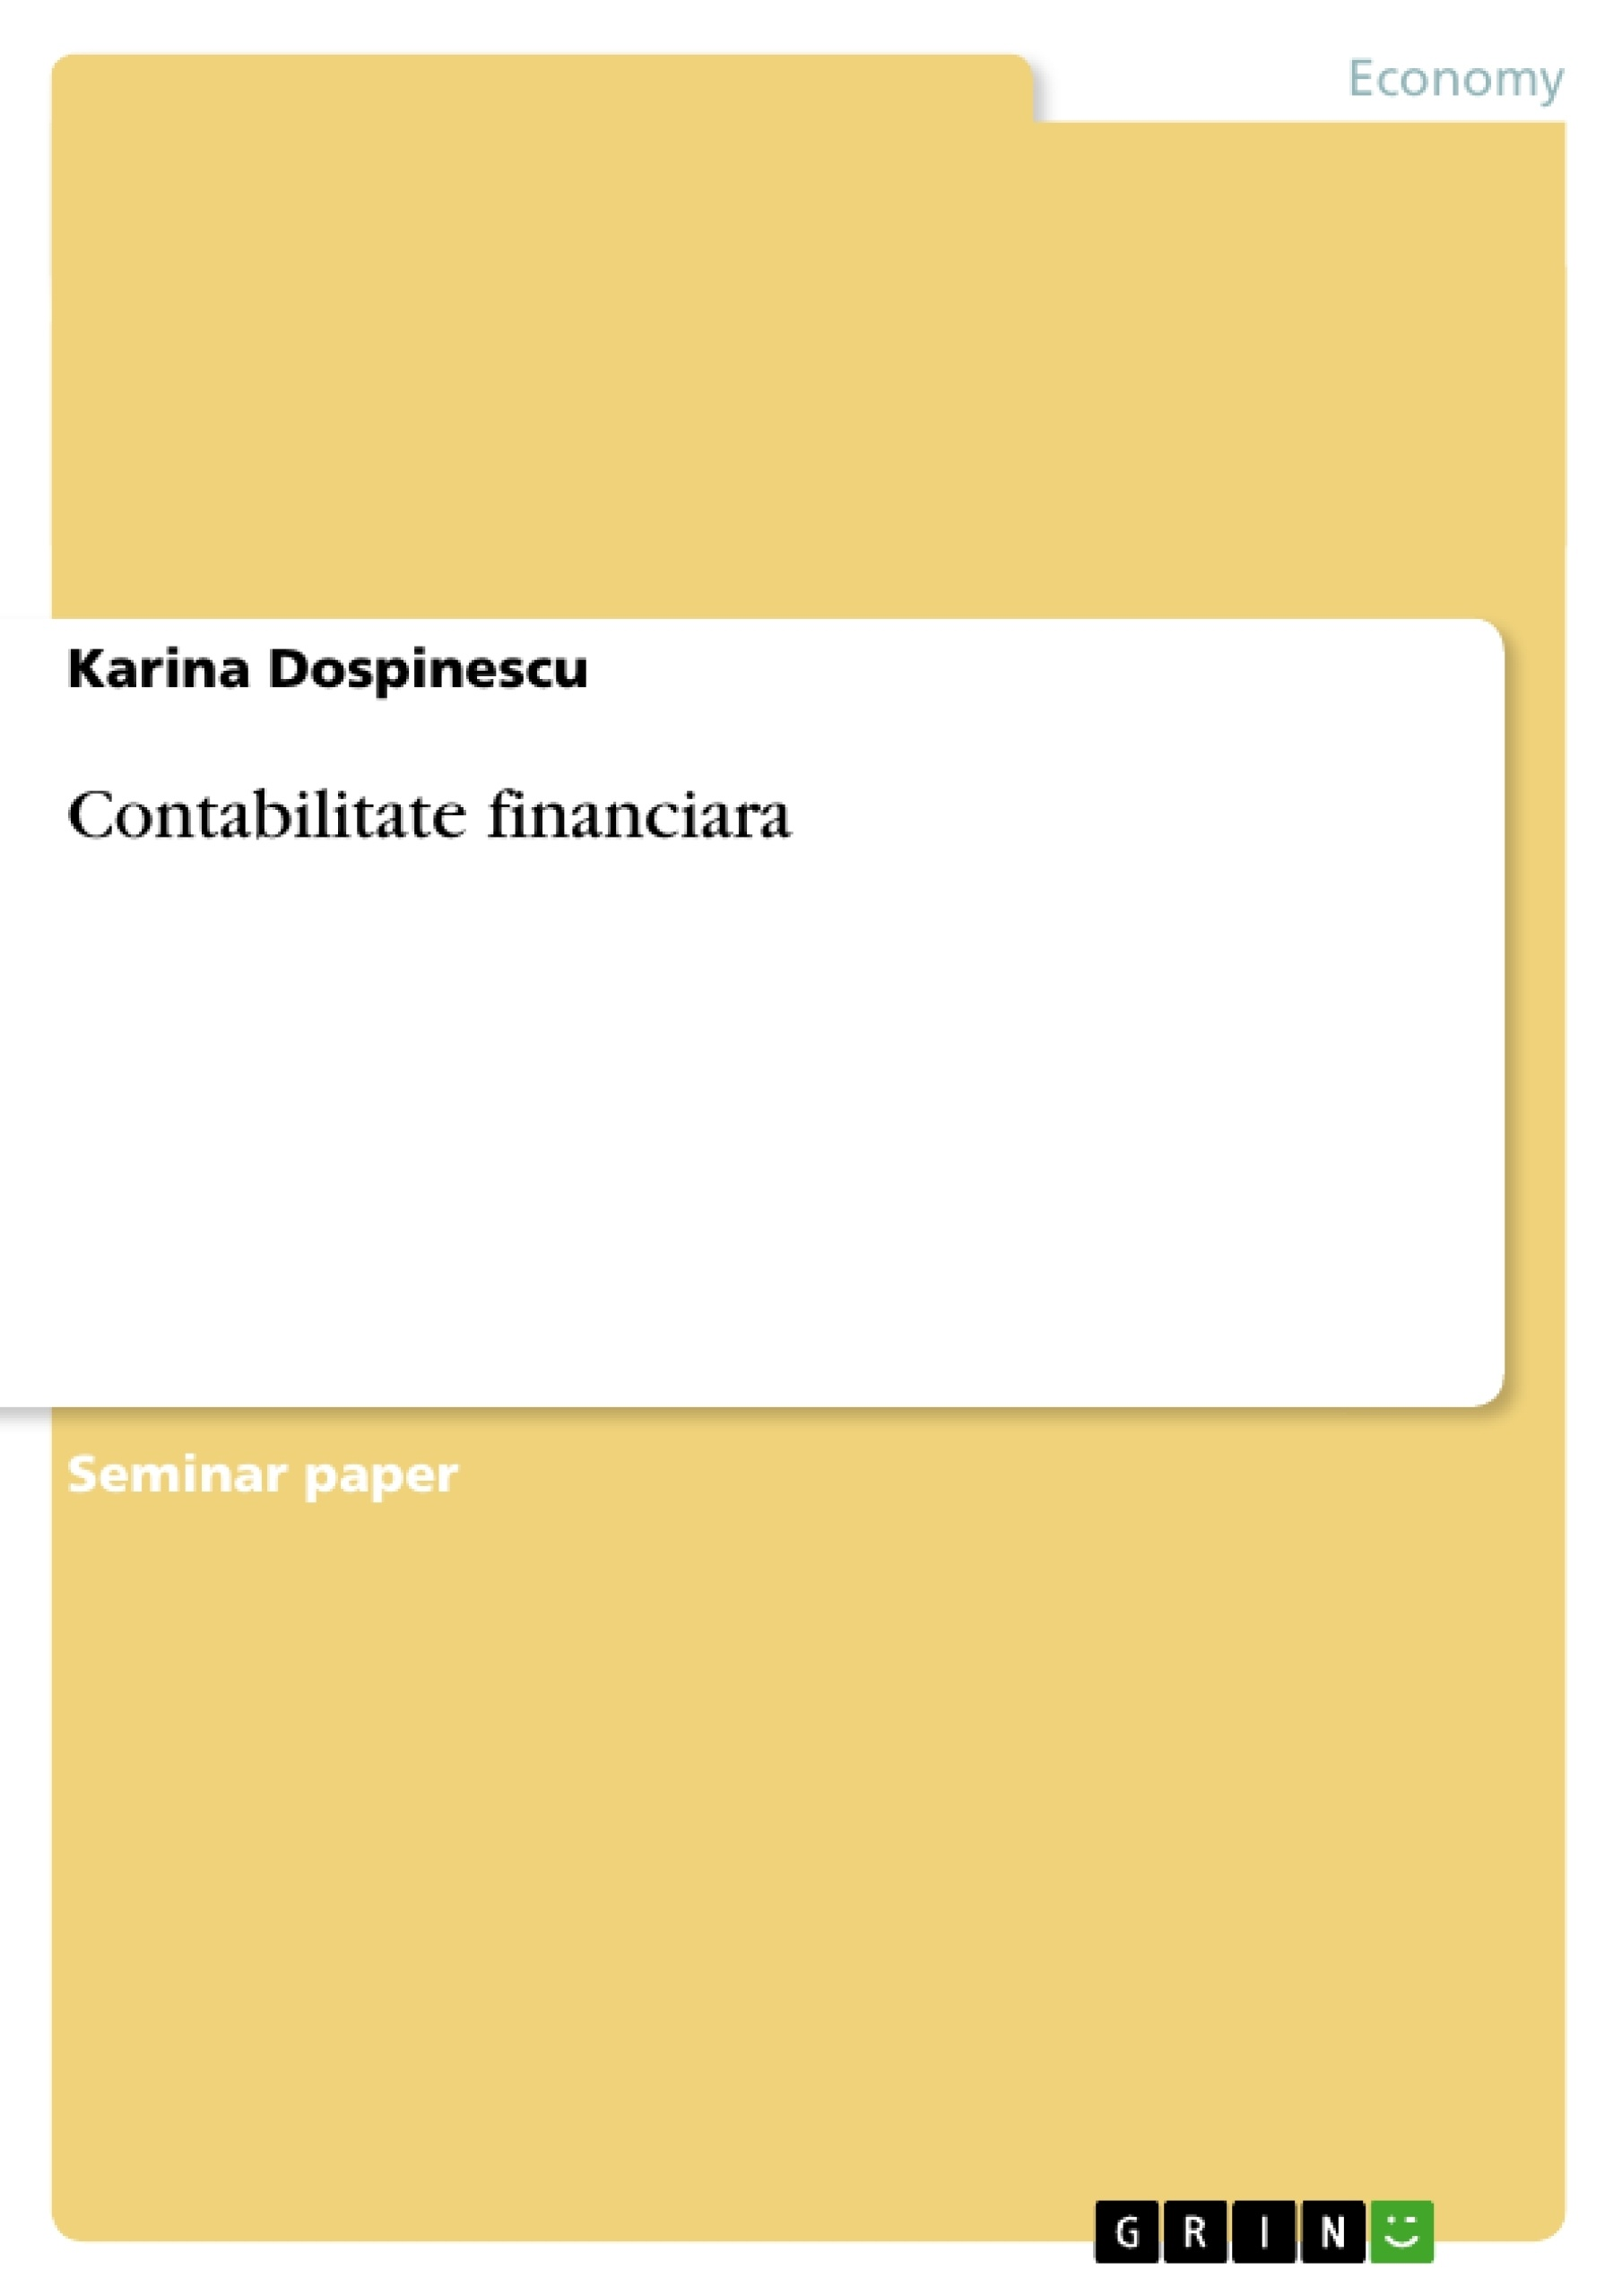 Title: Contabilitate financiara